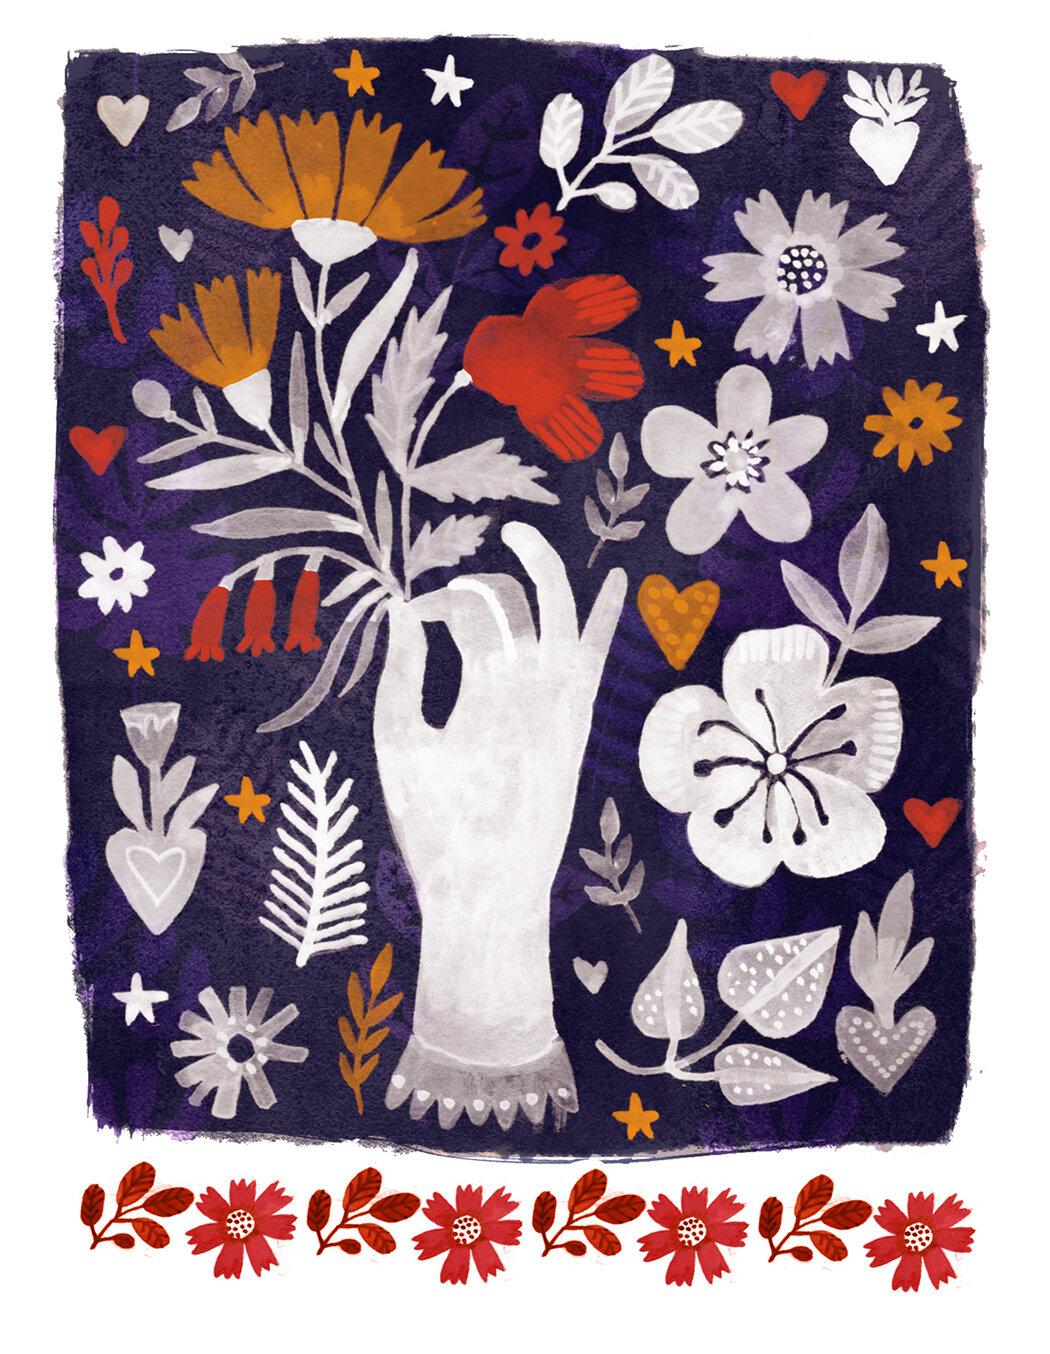 septemberflowers.jpg